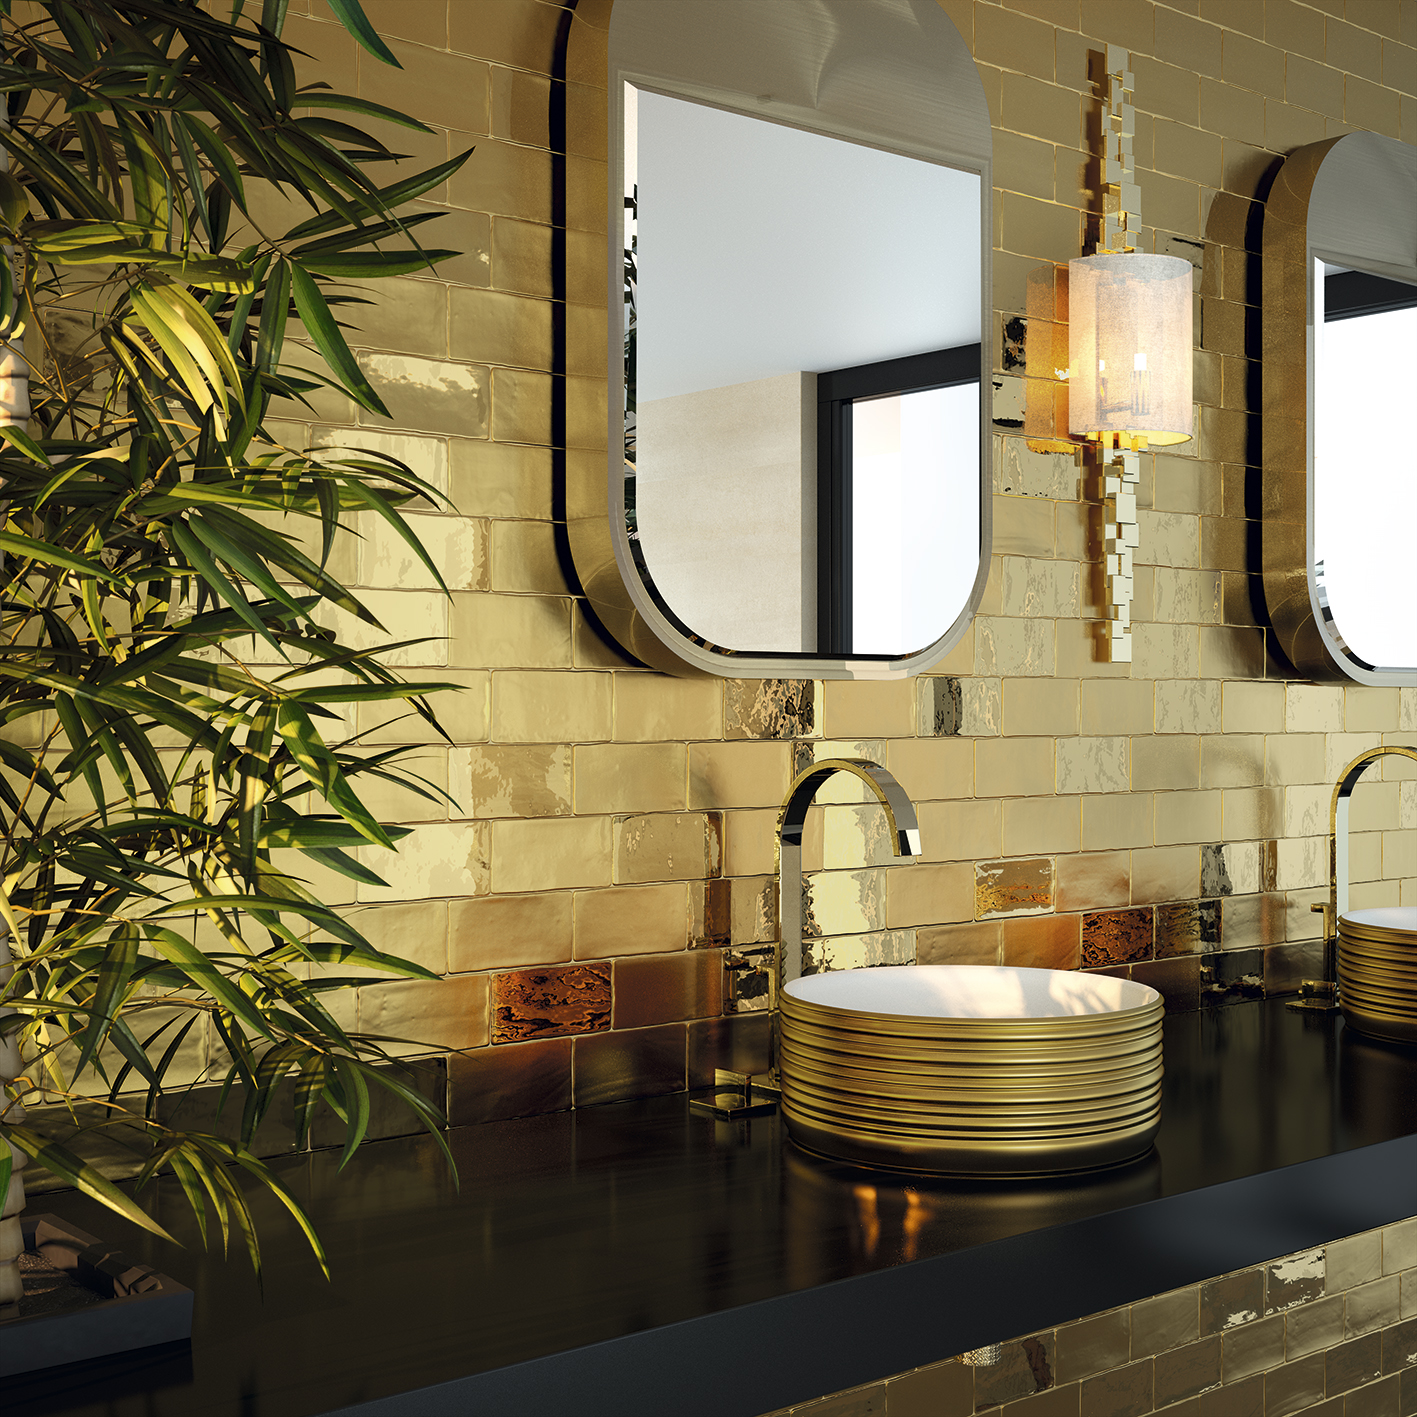 Wall & Floor Covering | Products | Rooja tejarat